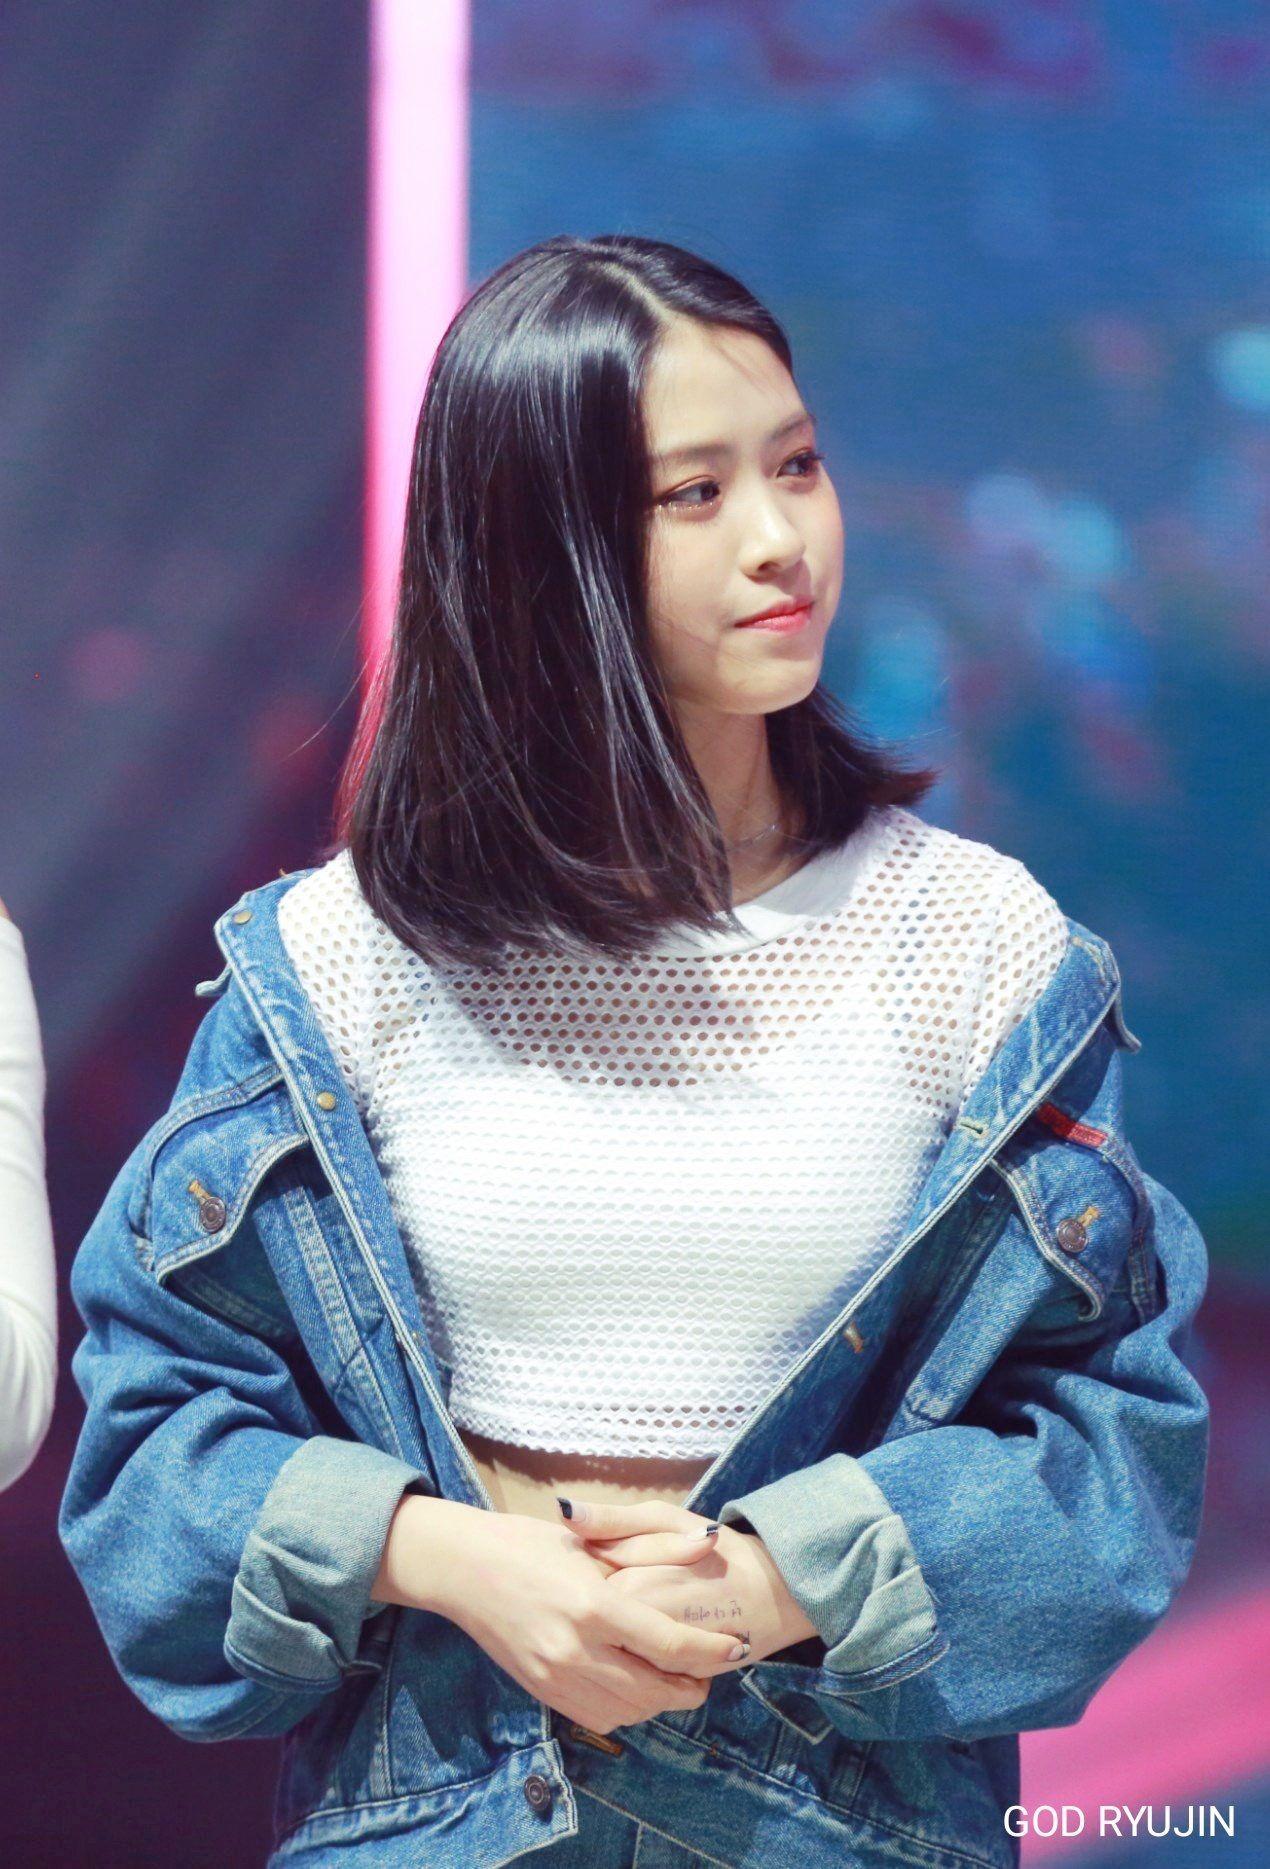 Shin Rhujin Shin Ryujin Mixnine 2nd Mission Winner Really Really Cr God Ryujin 신류진 믹스나인 Jyp Itzy Fashion Korean Girl